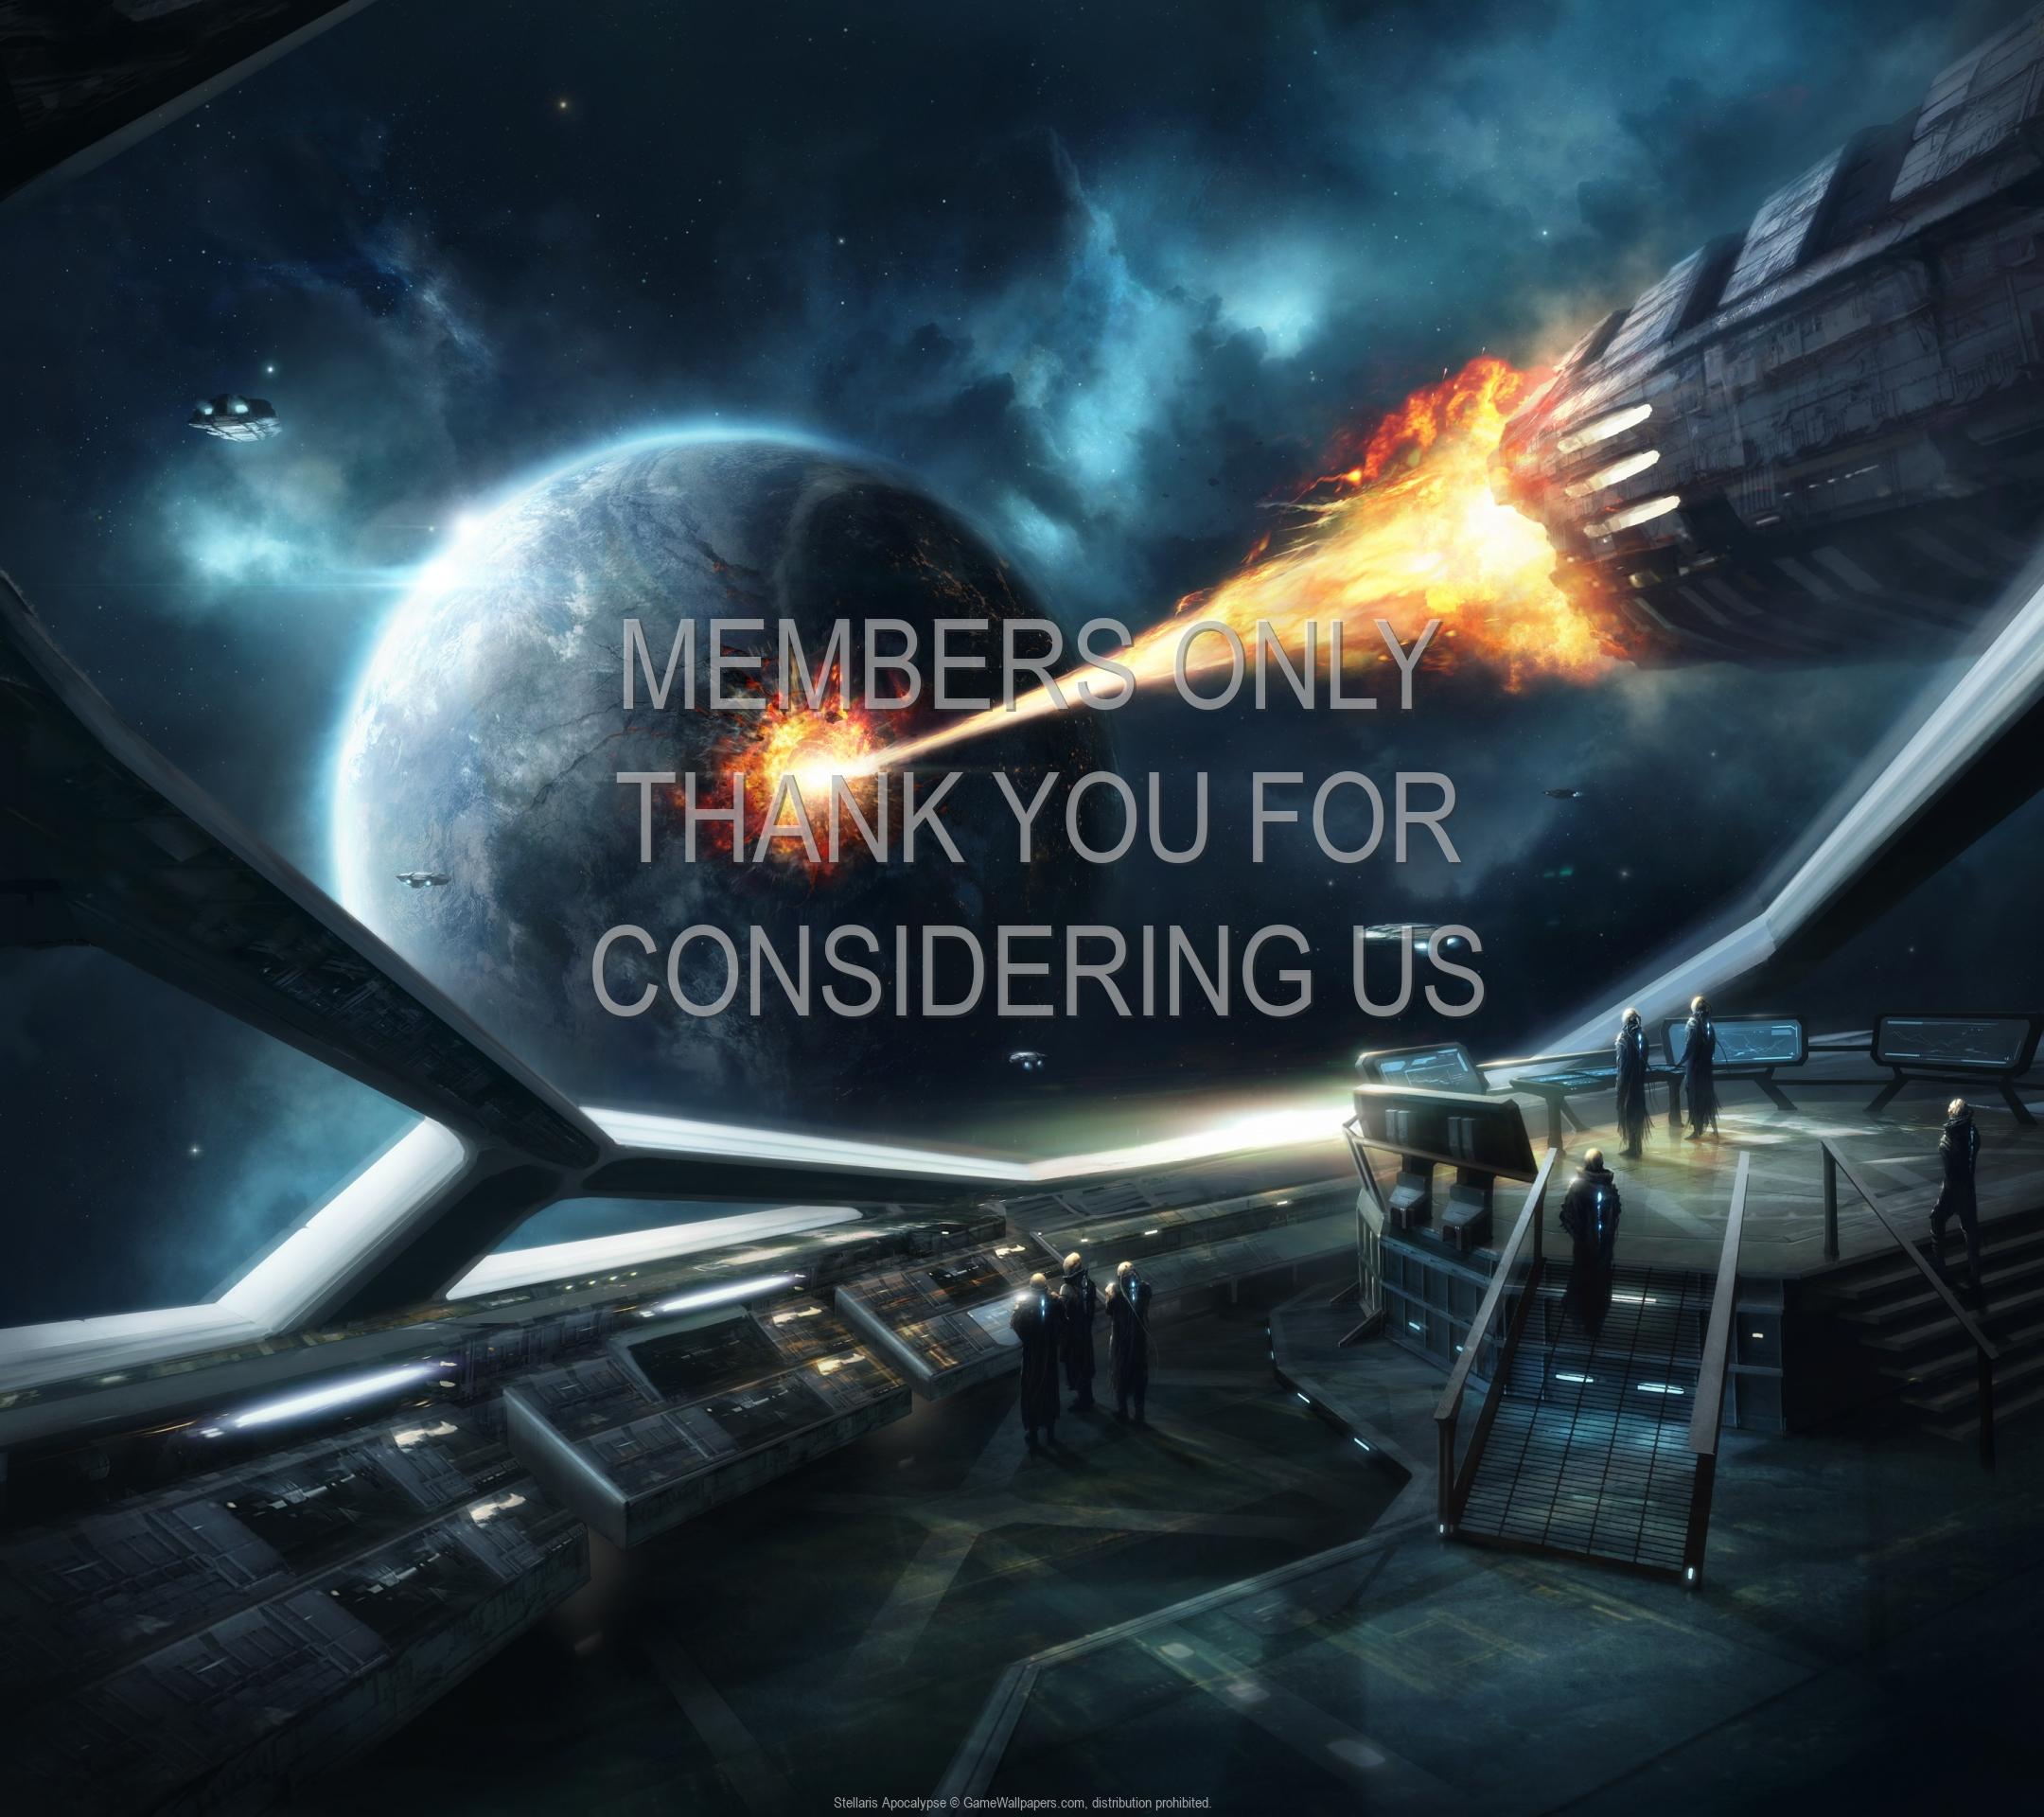 Stellaris: Apocalypse 1920x1080 Mobile wallpaper or background 01